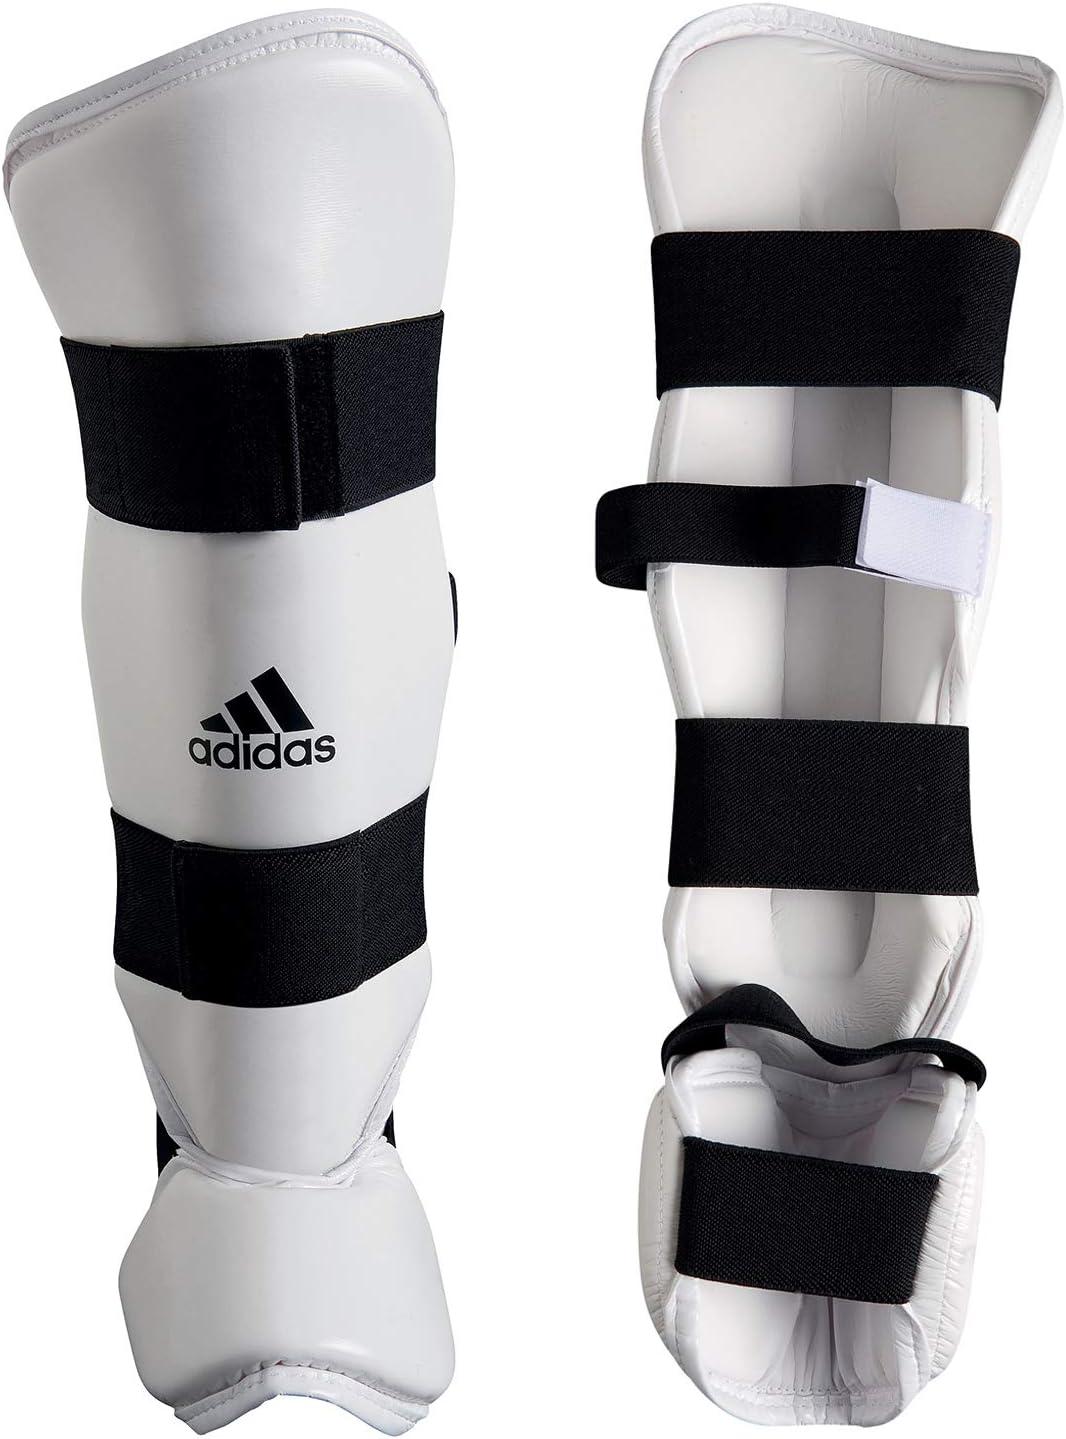 Adidas Shin Instep Guard Protector